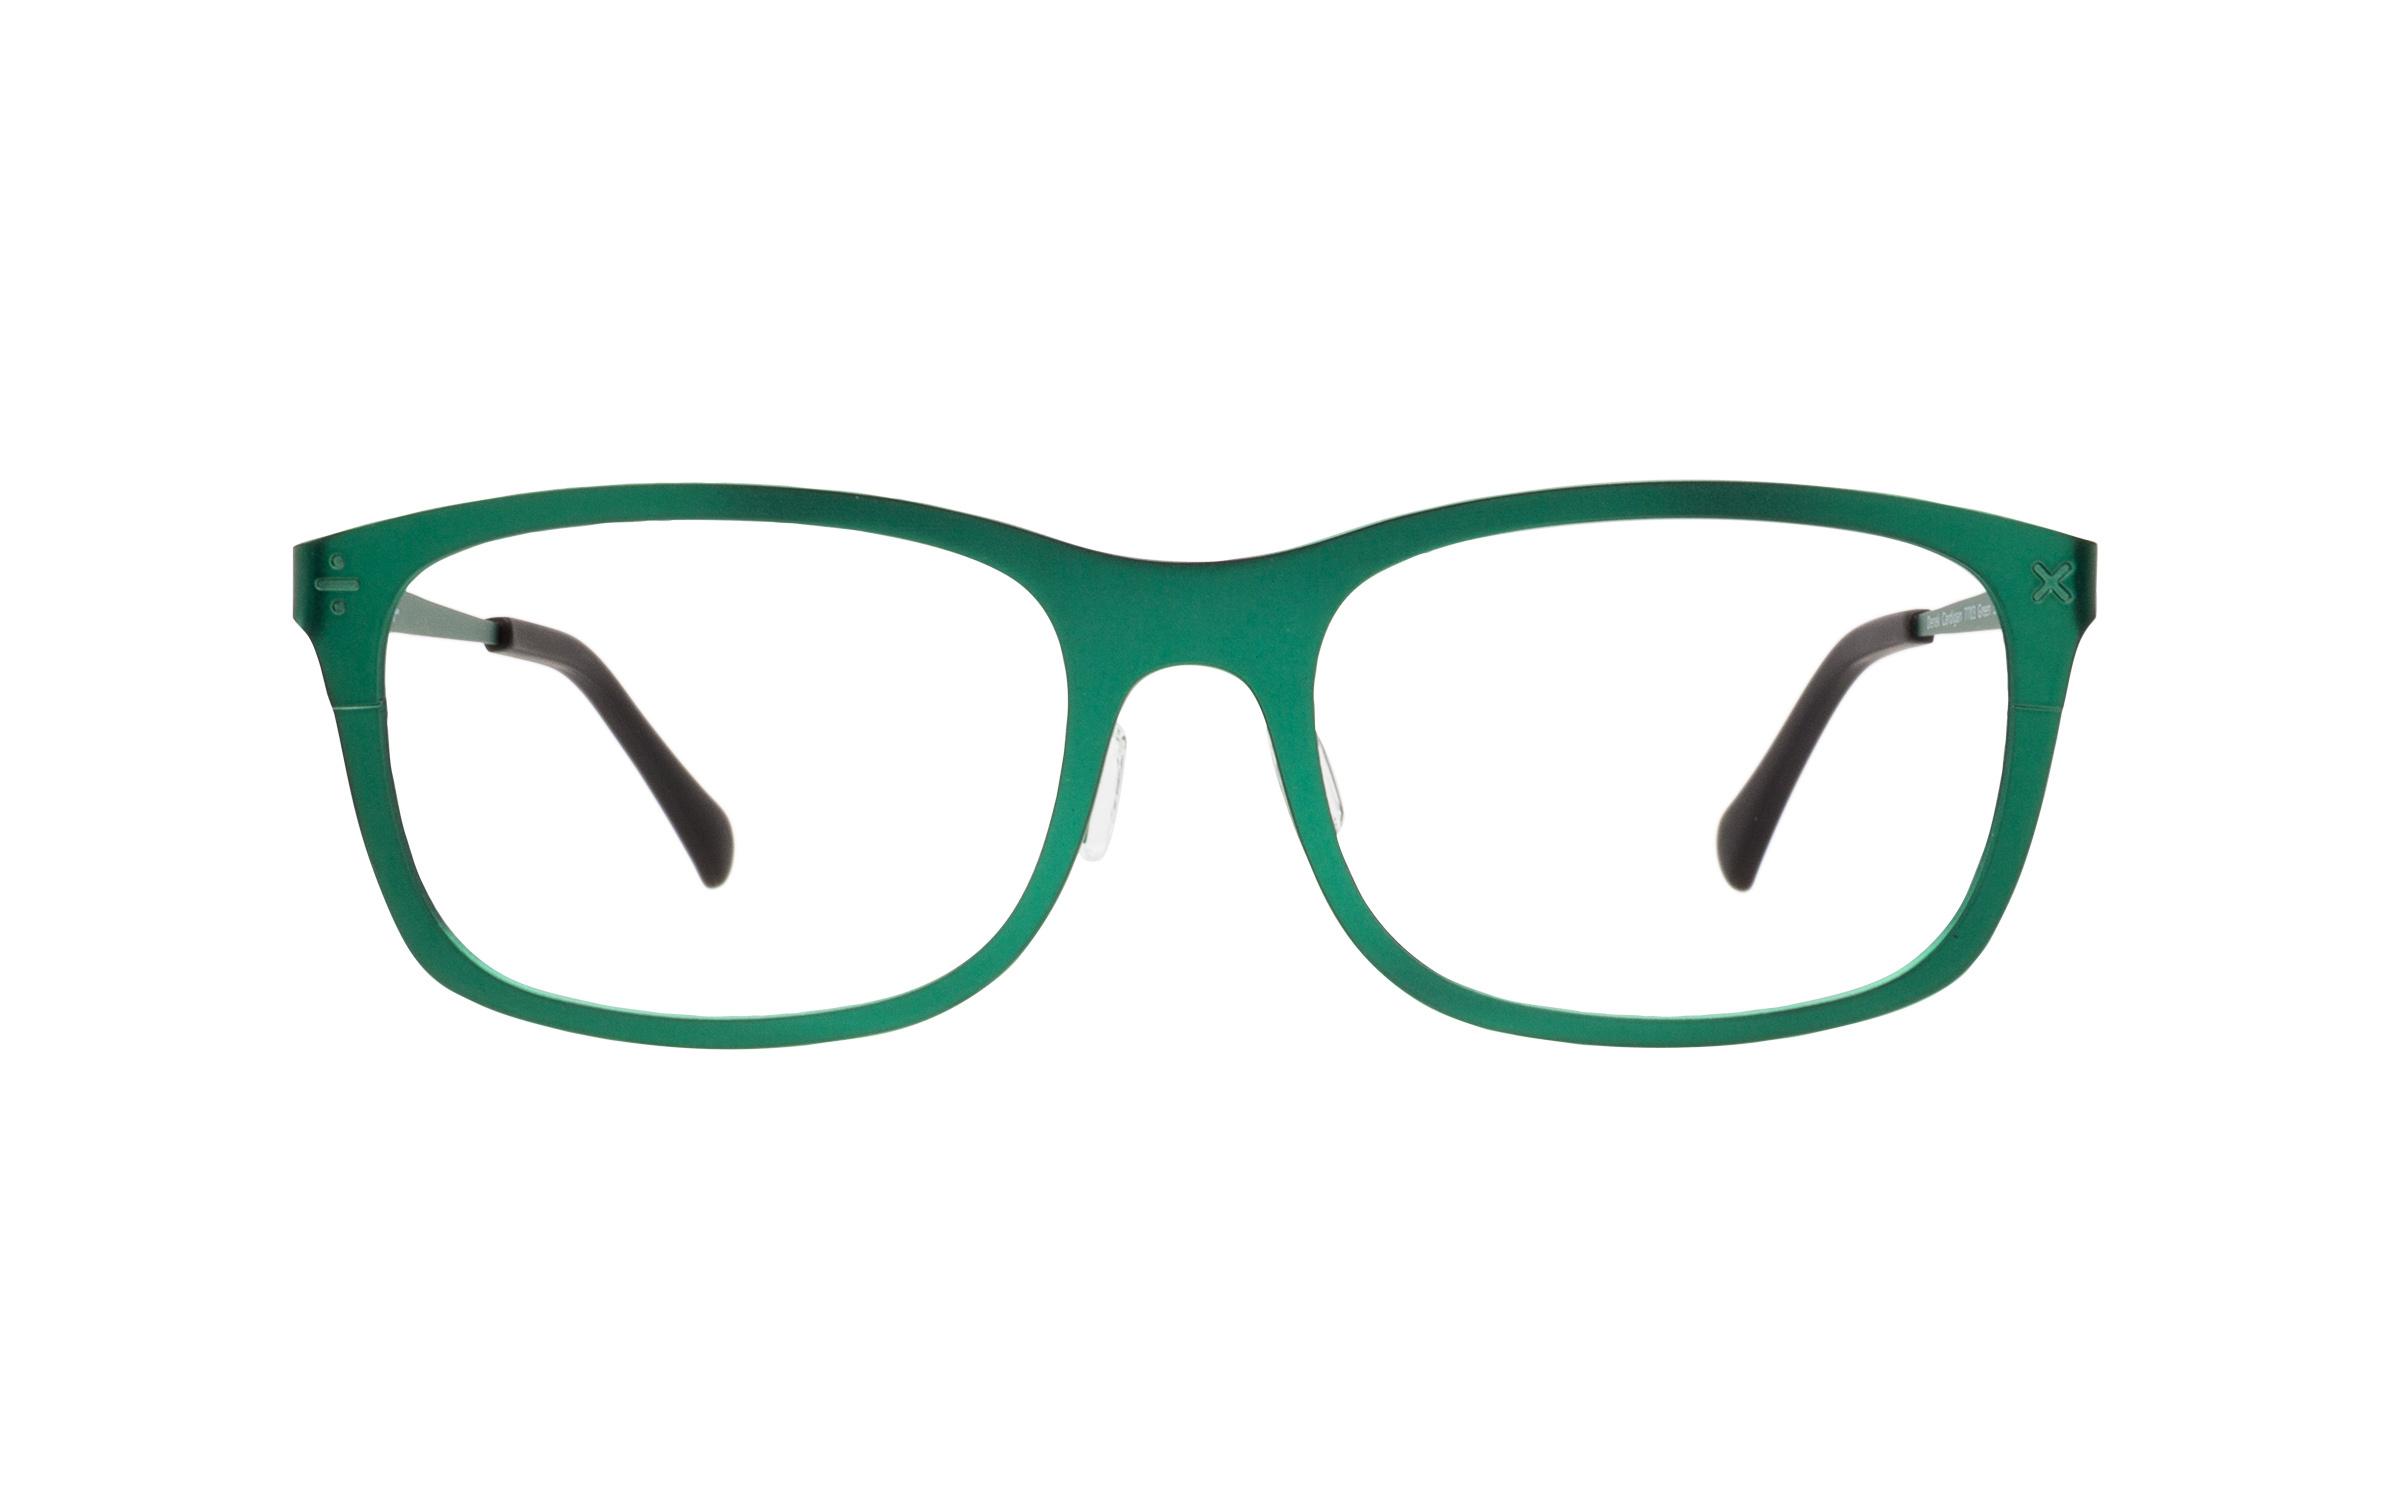 Derek Cardigan Max 7703 Green Glasses, Eyeglasses & Frame...